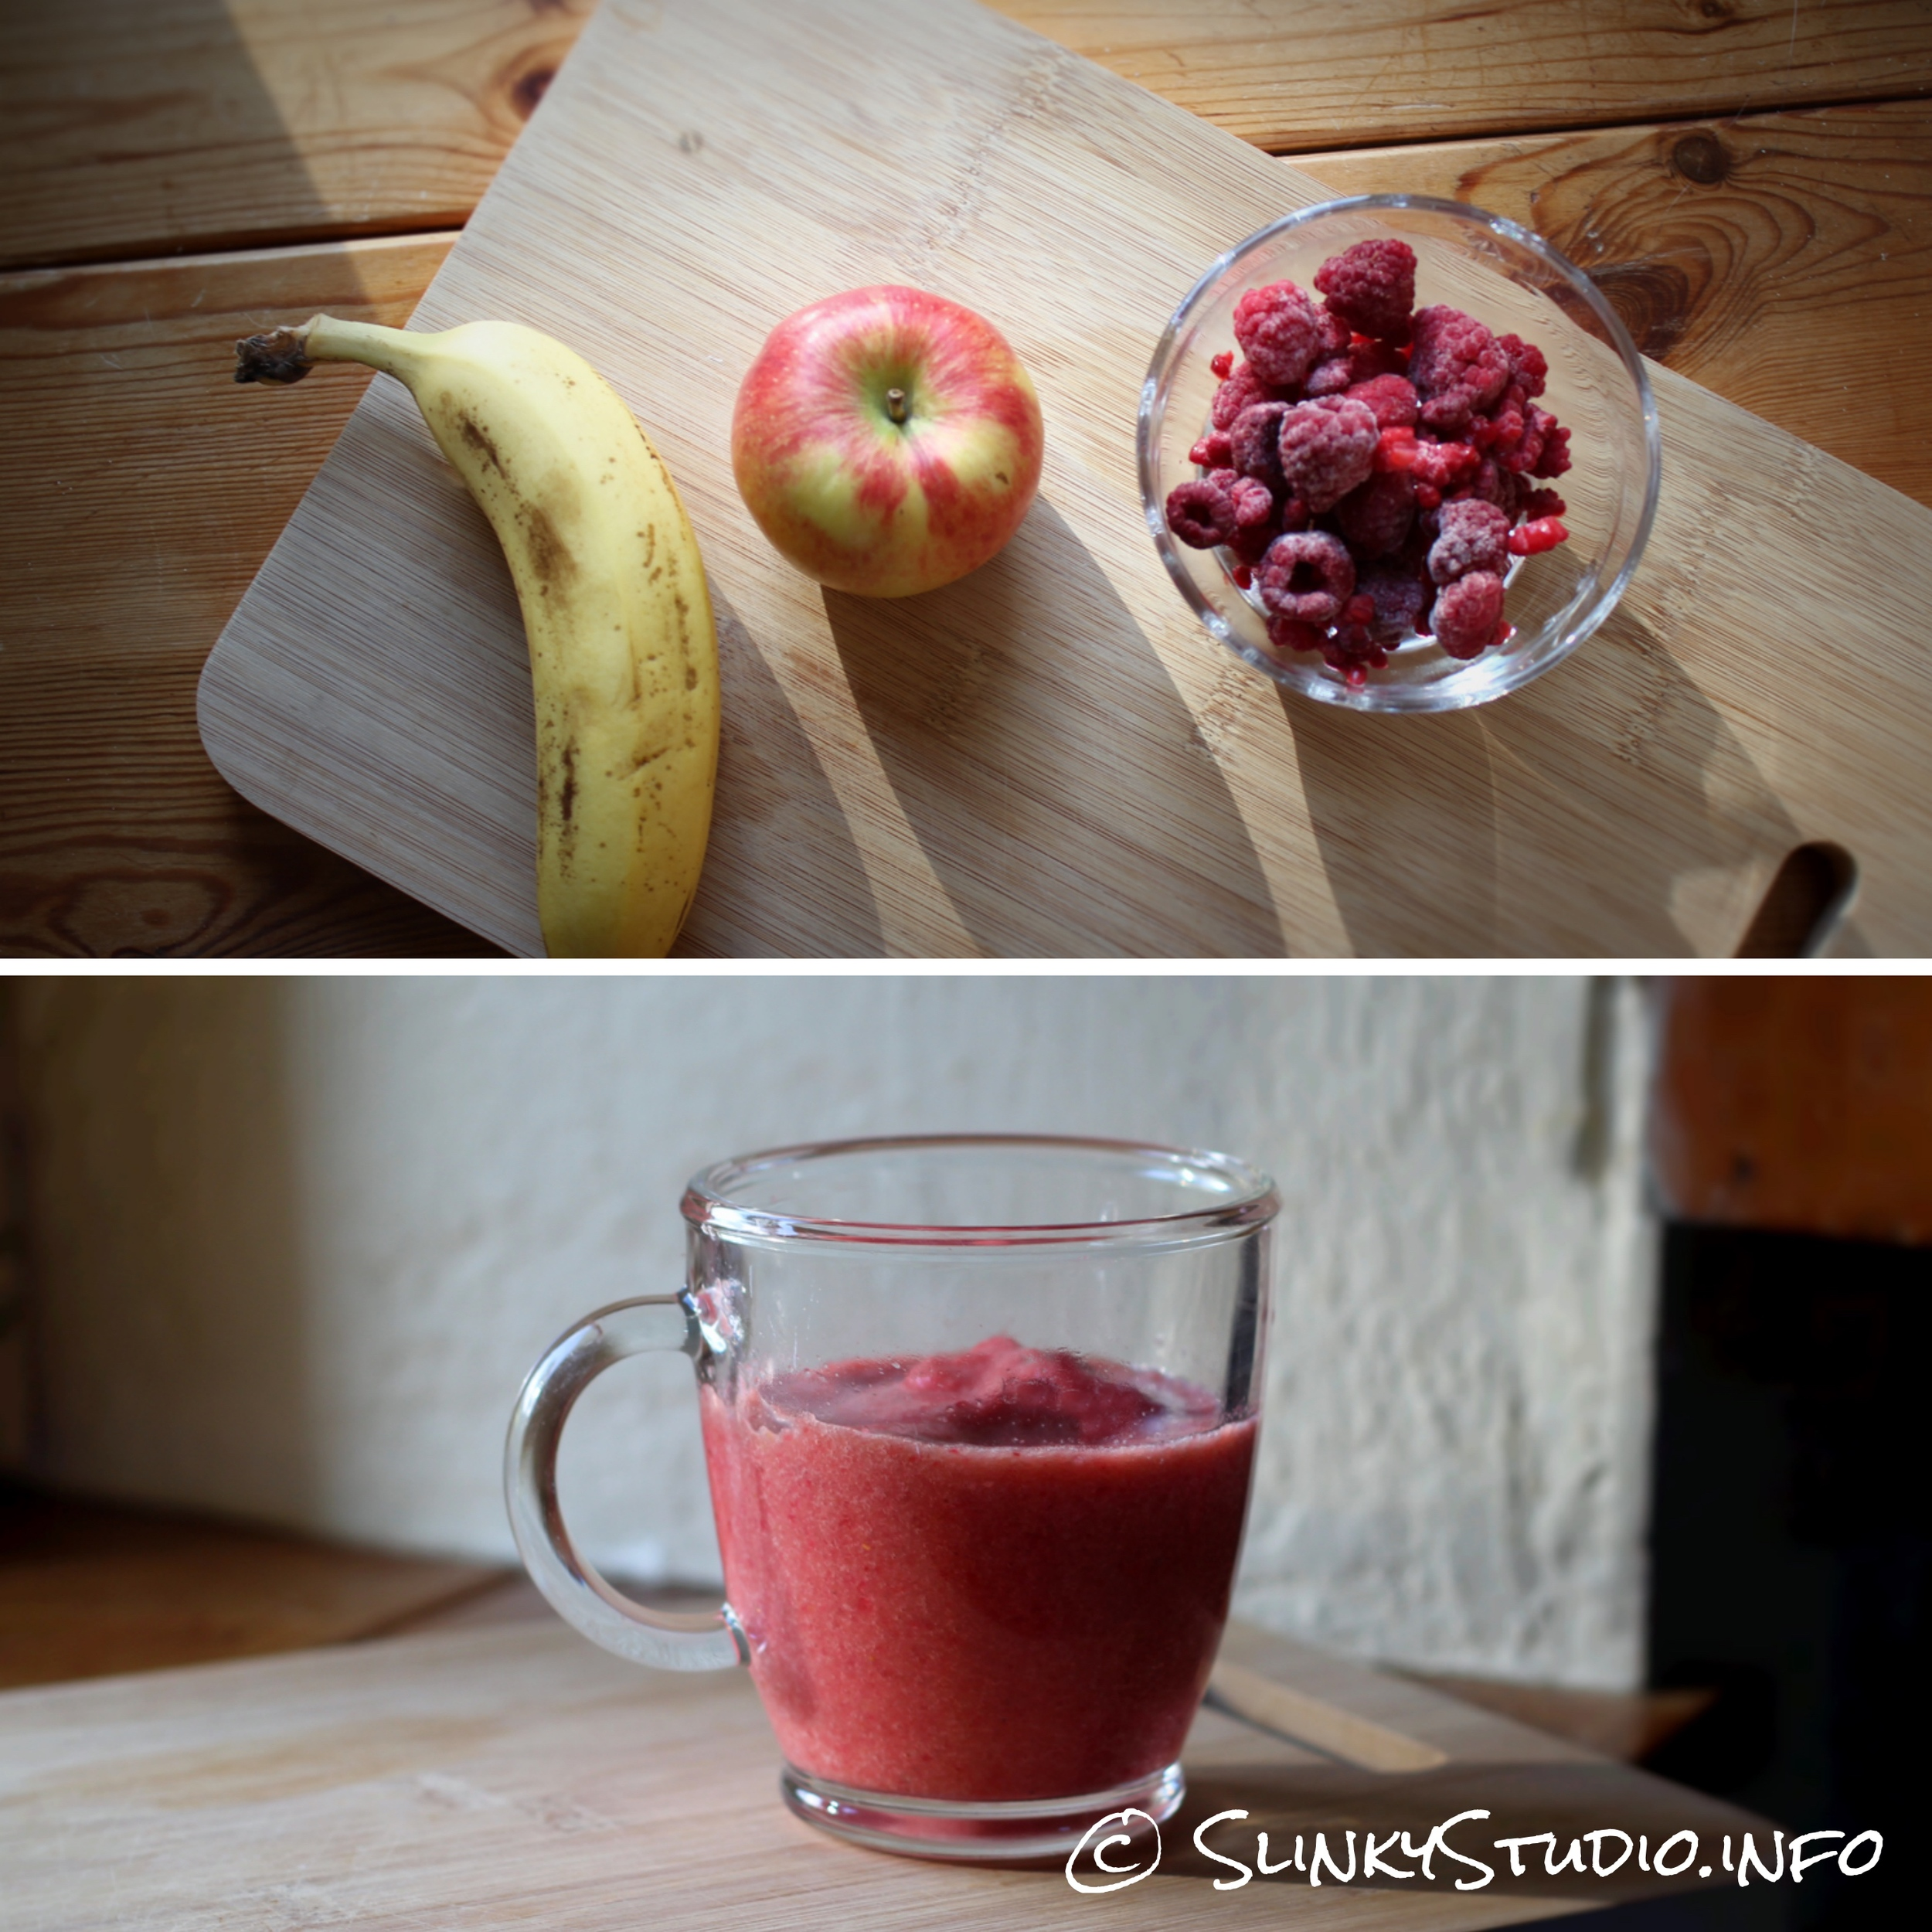 Novis Vita Juicer Apple Banana Raspberry Smoothie